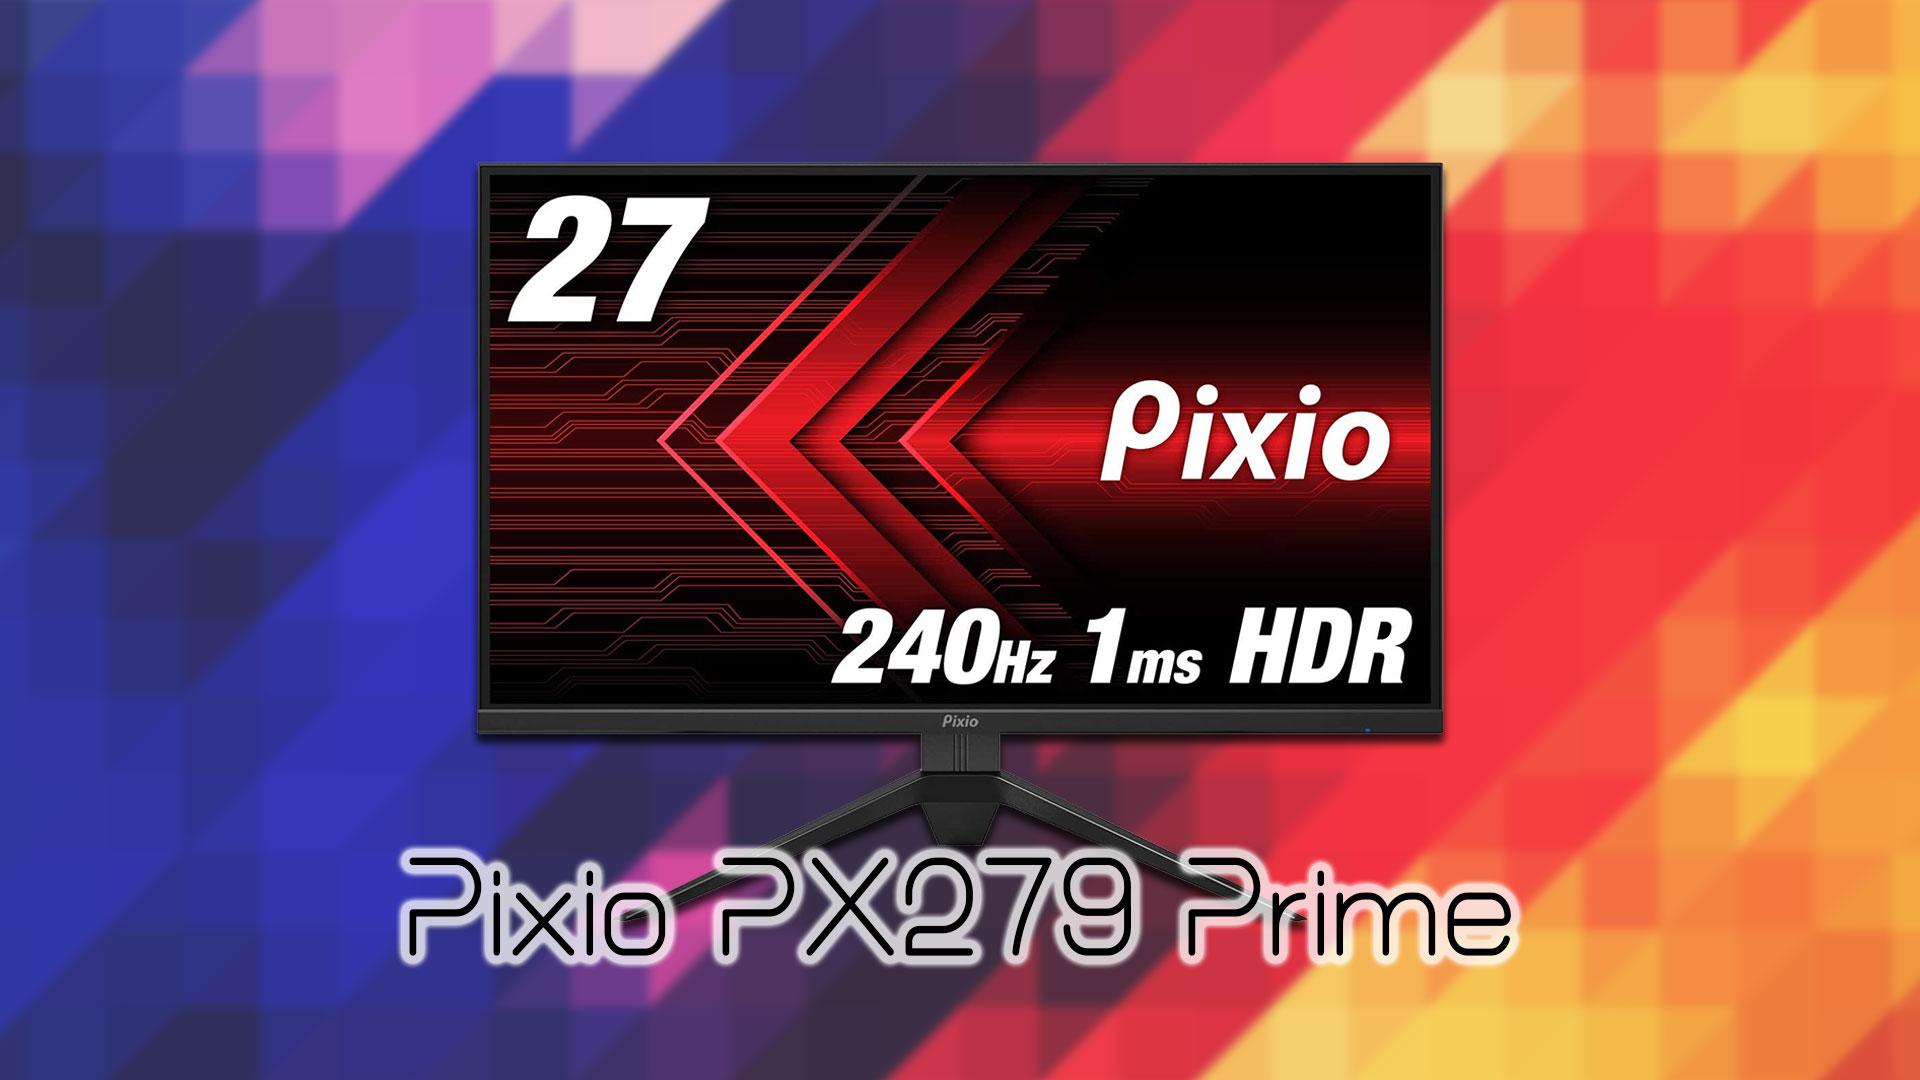 「Pixio PX279 Prime」ってモニターアーム使えるの?VESAサイズやおすすめアームはどれ?